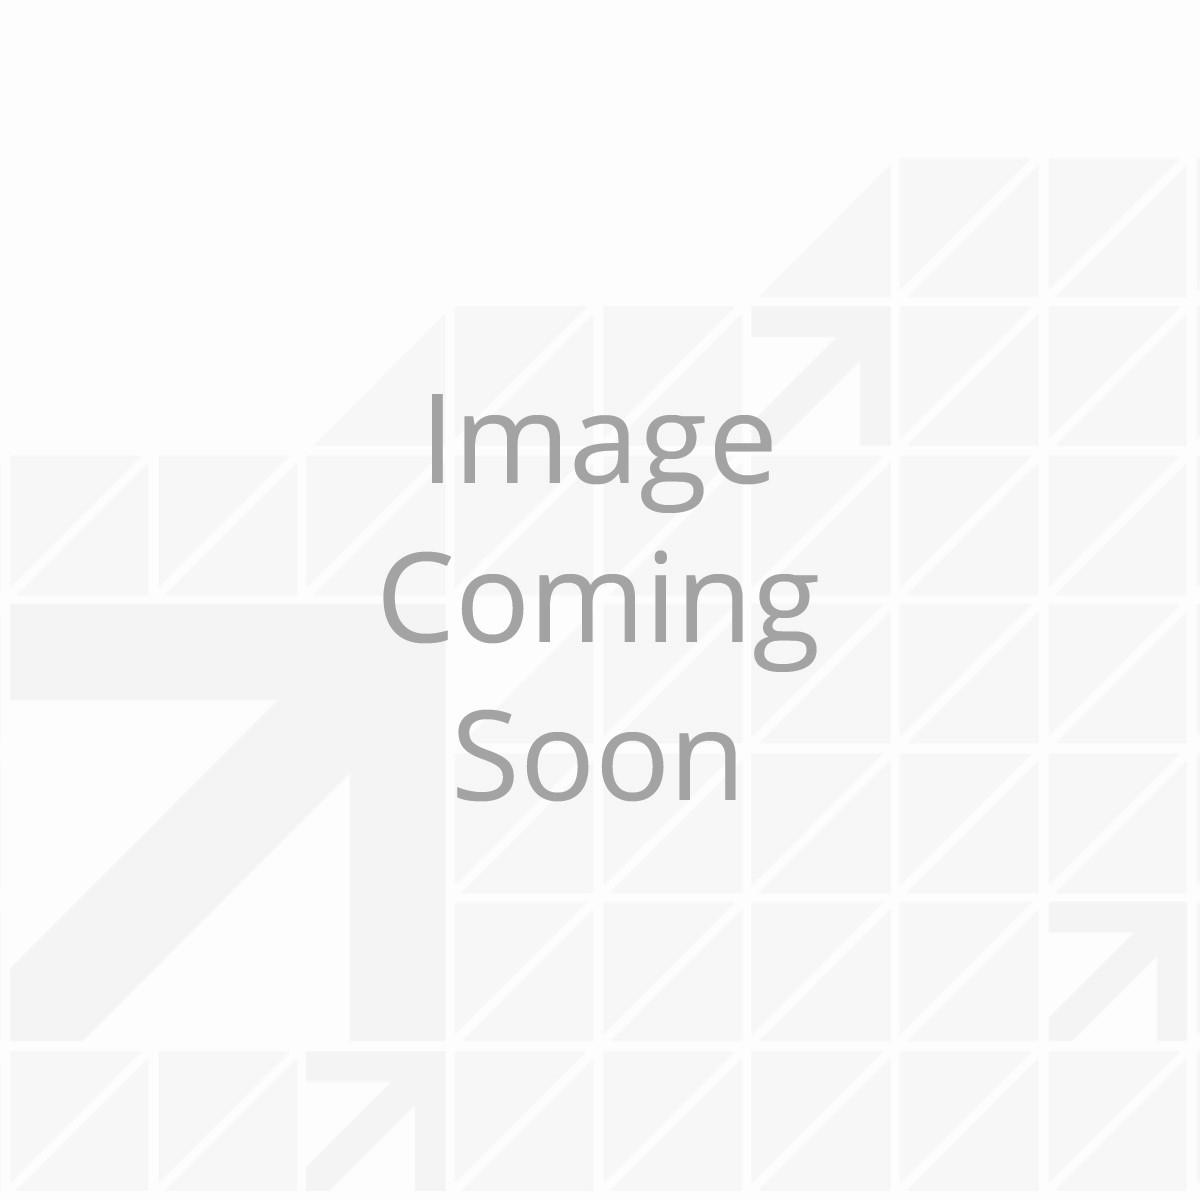 Wide-Stance Tandem Axle Kit - Equa-Flex® Equalizers